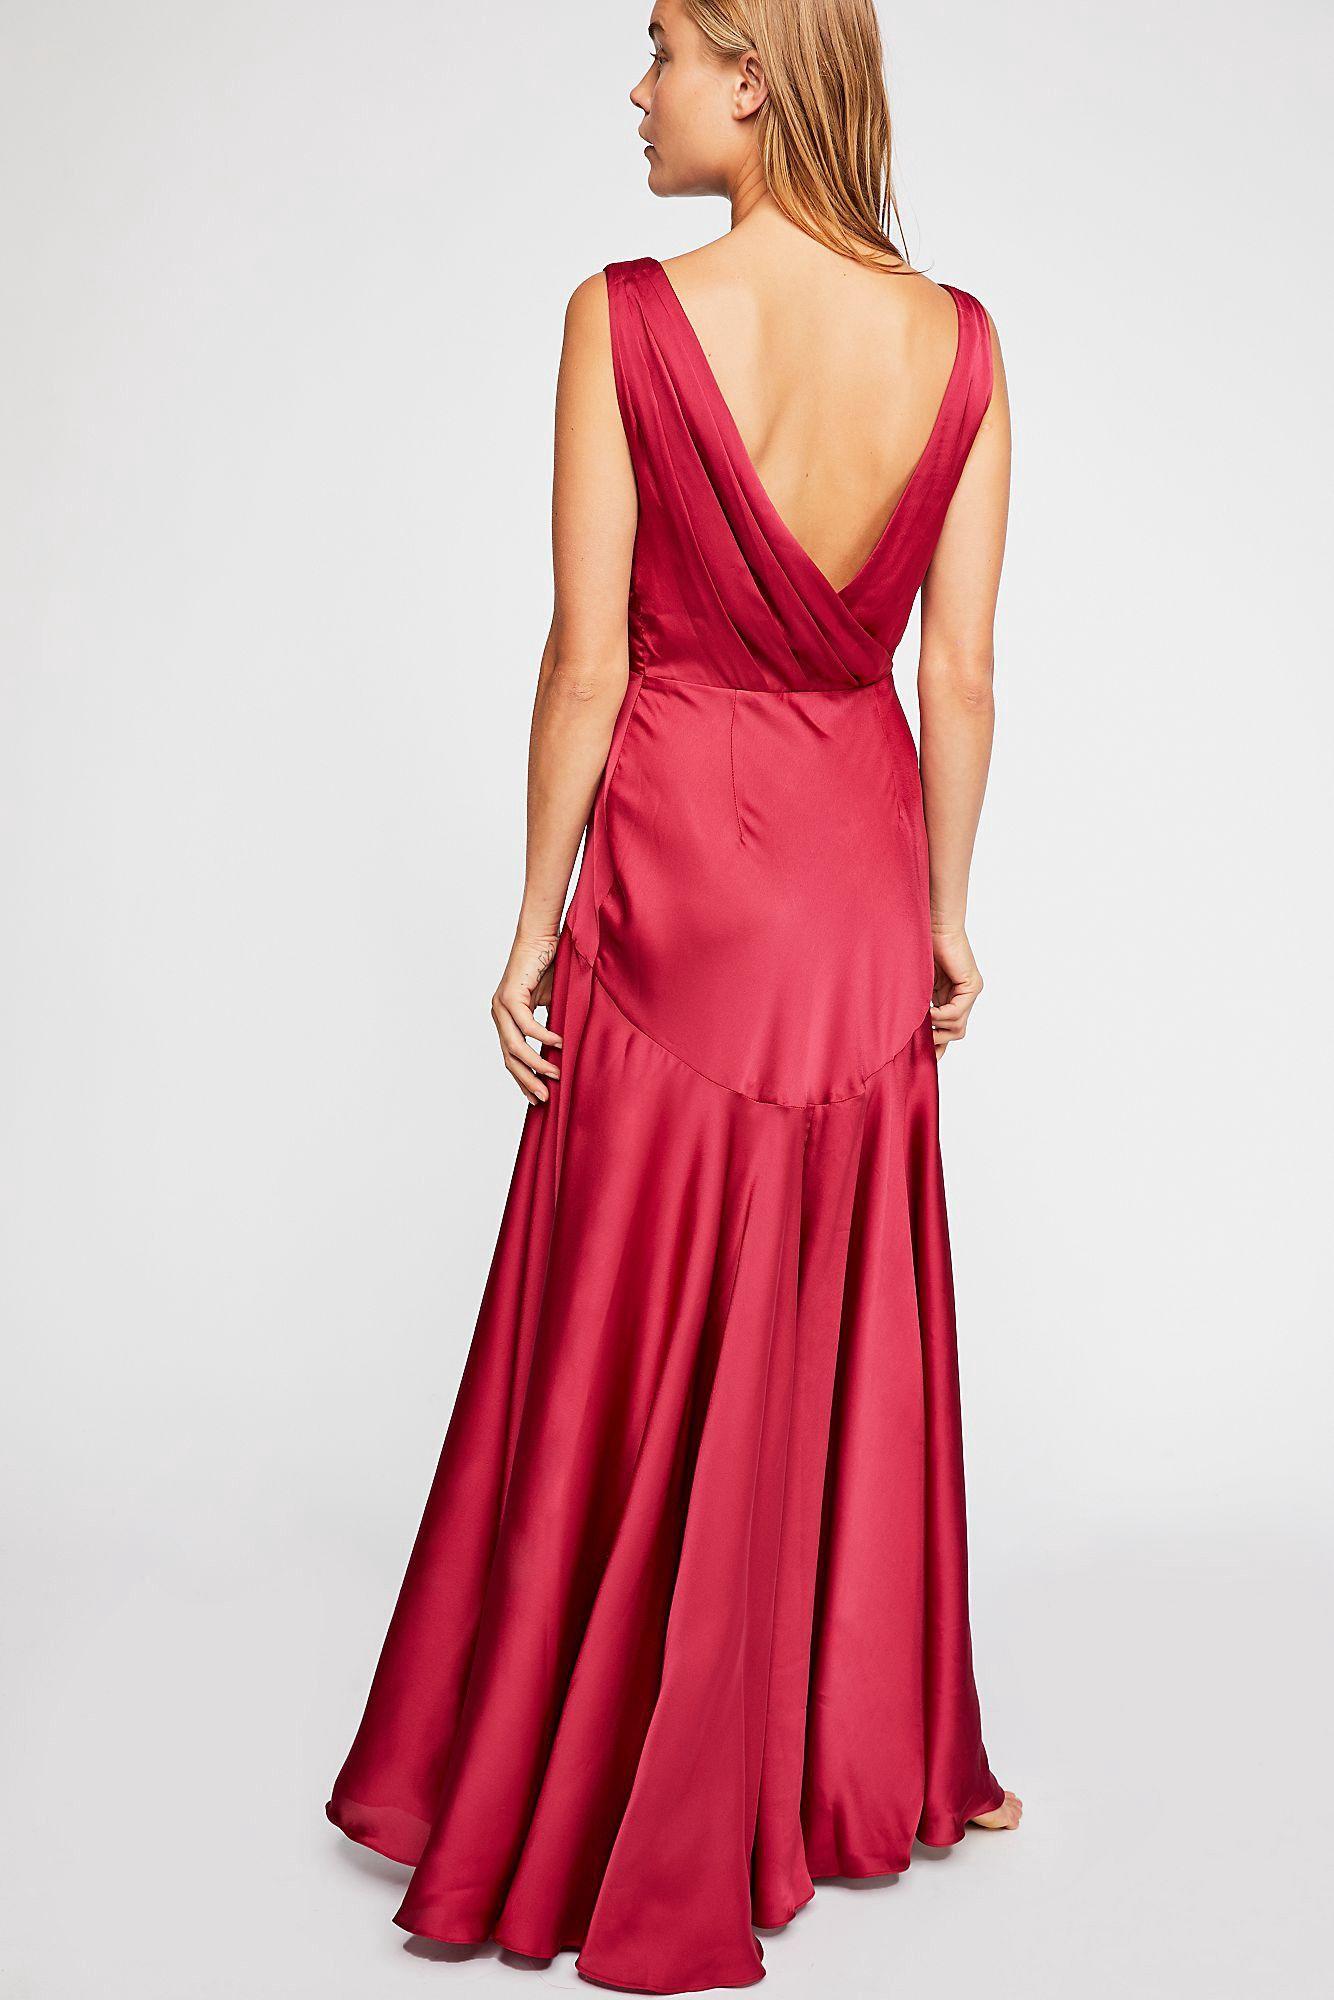 f1ad1e4008 Free People Essie Maxi Dress - Burgundy 6